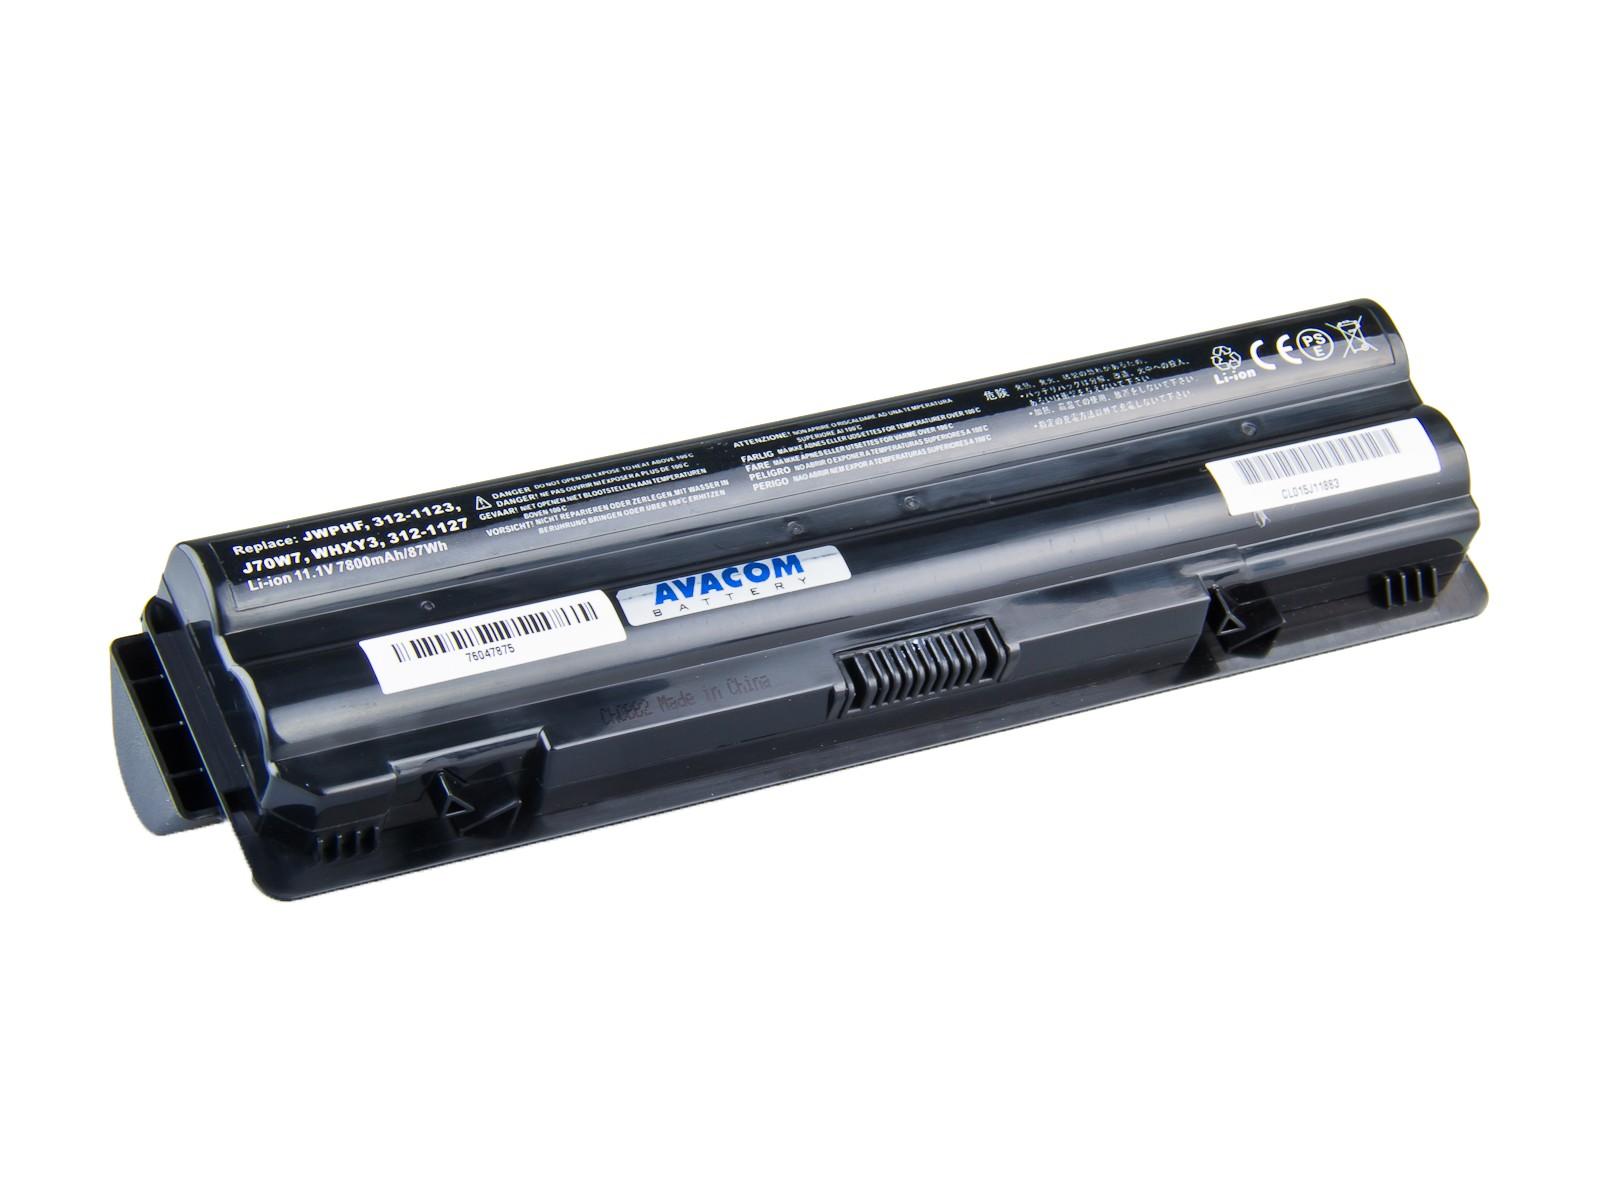 Náhradní baterie AVACOM Dell XPS 14/15/17 Li-ion 11,1V 7800mAh/87Wh